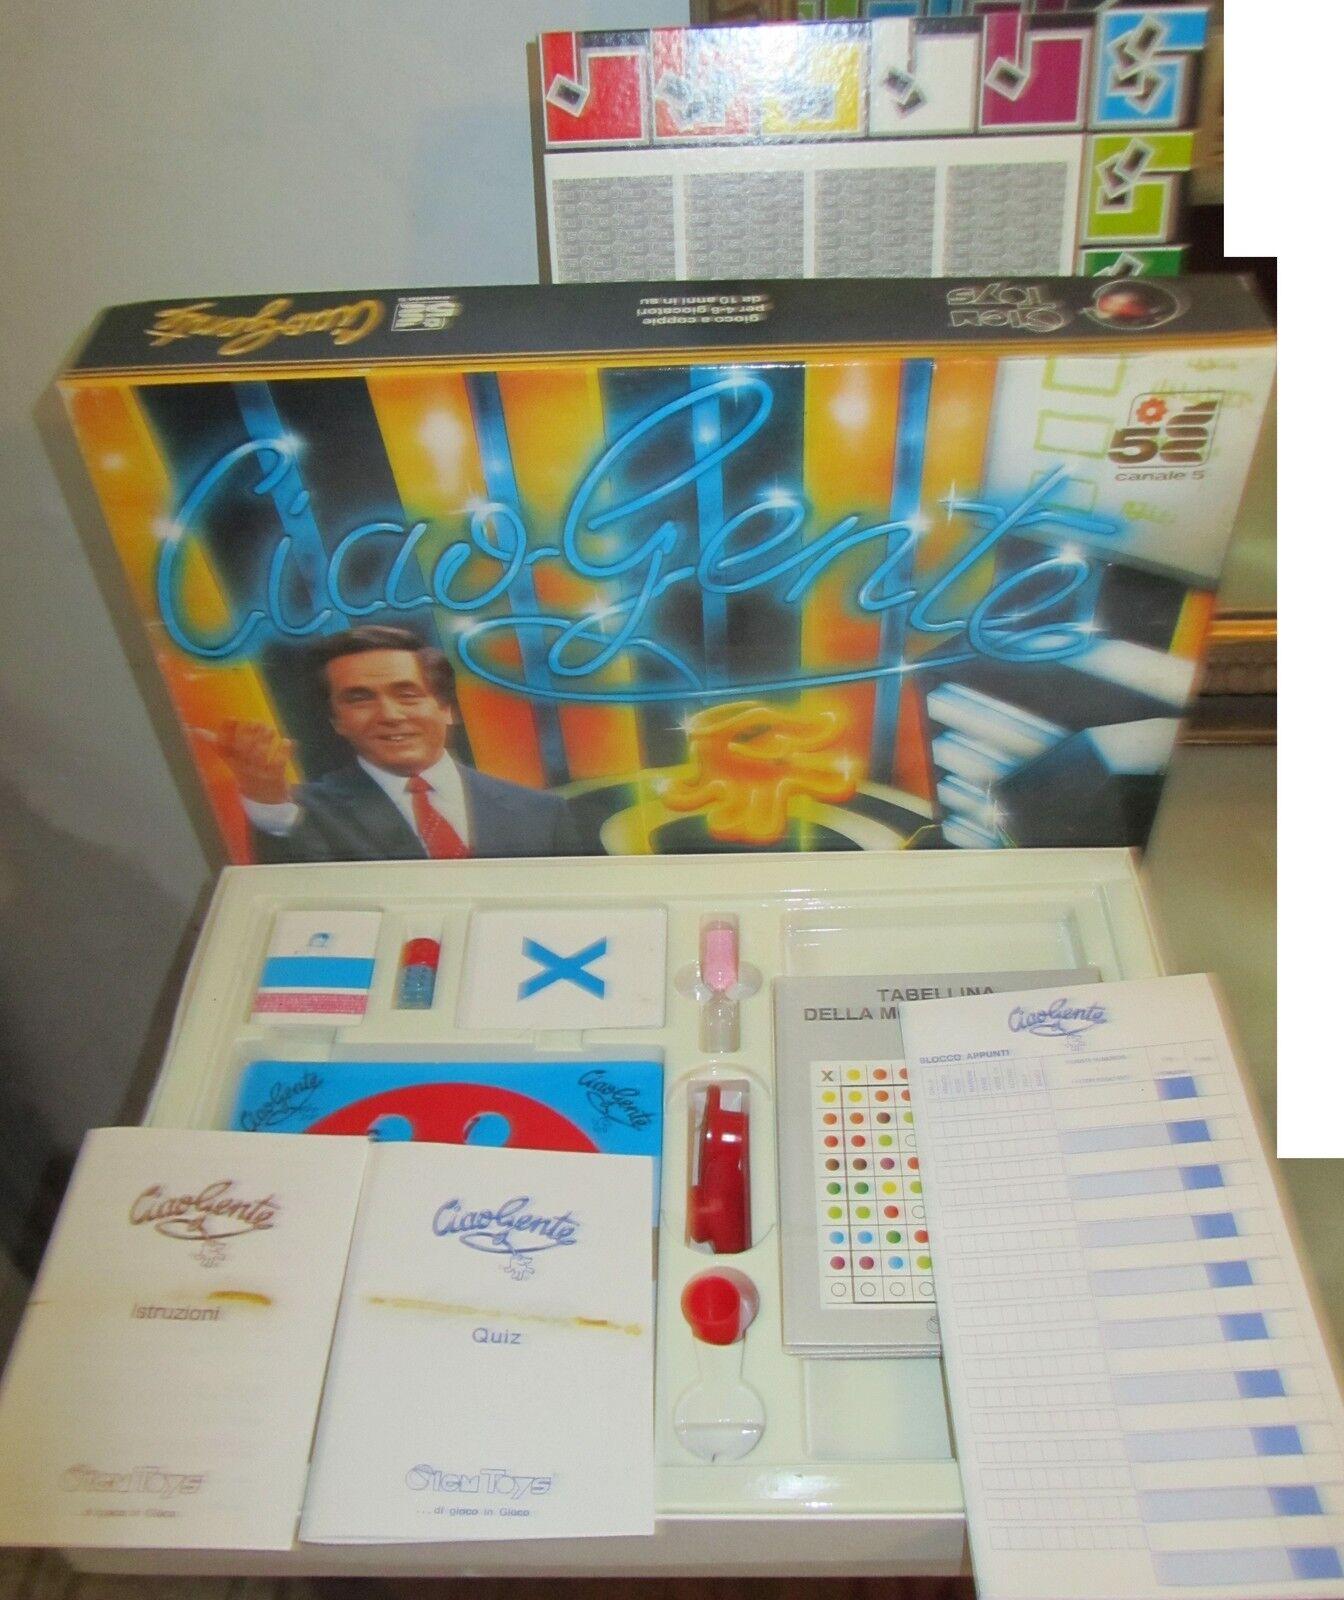 Ciao Gente Corrado -  Board Game Gioco In Scatola Tavolo Clementoni Clem Toys